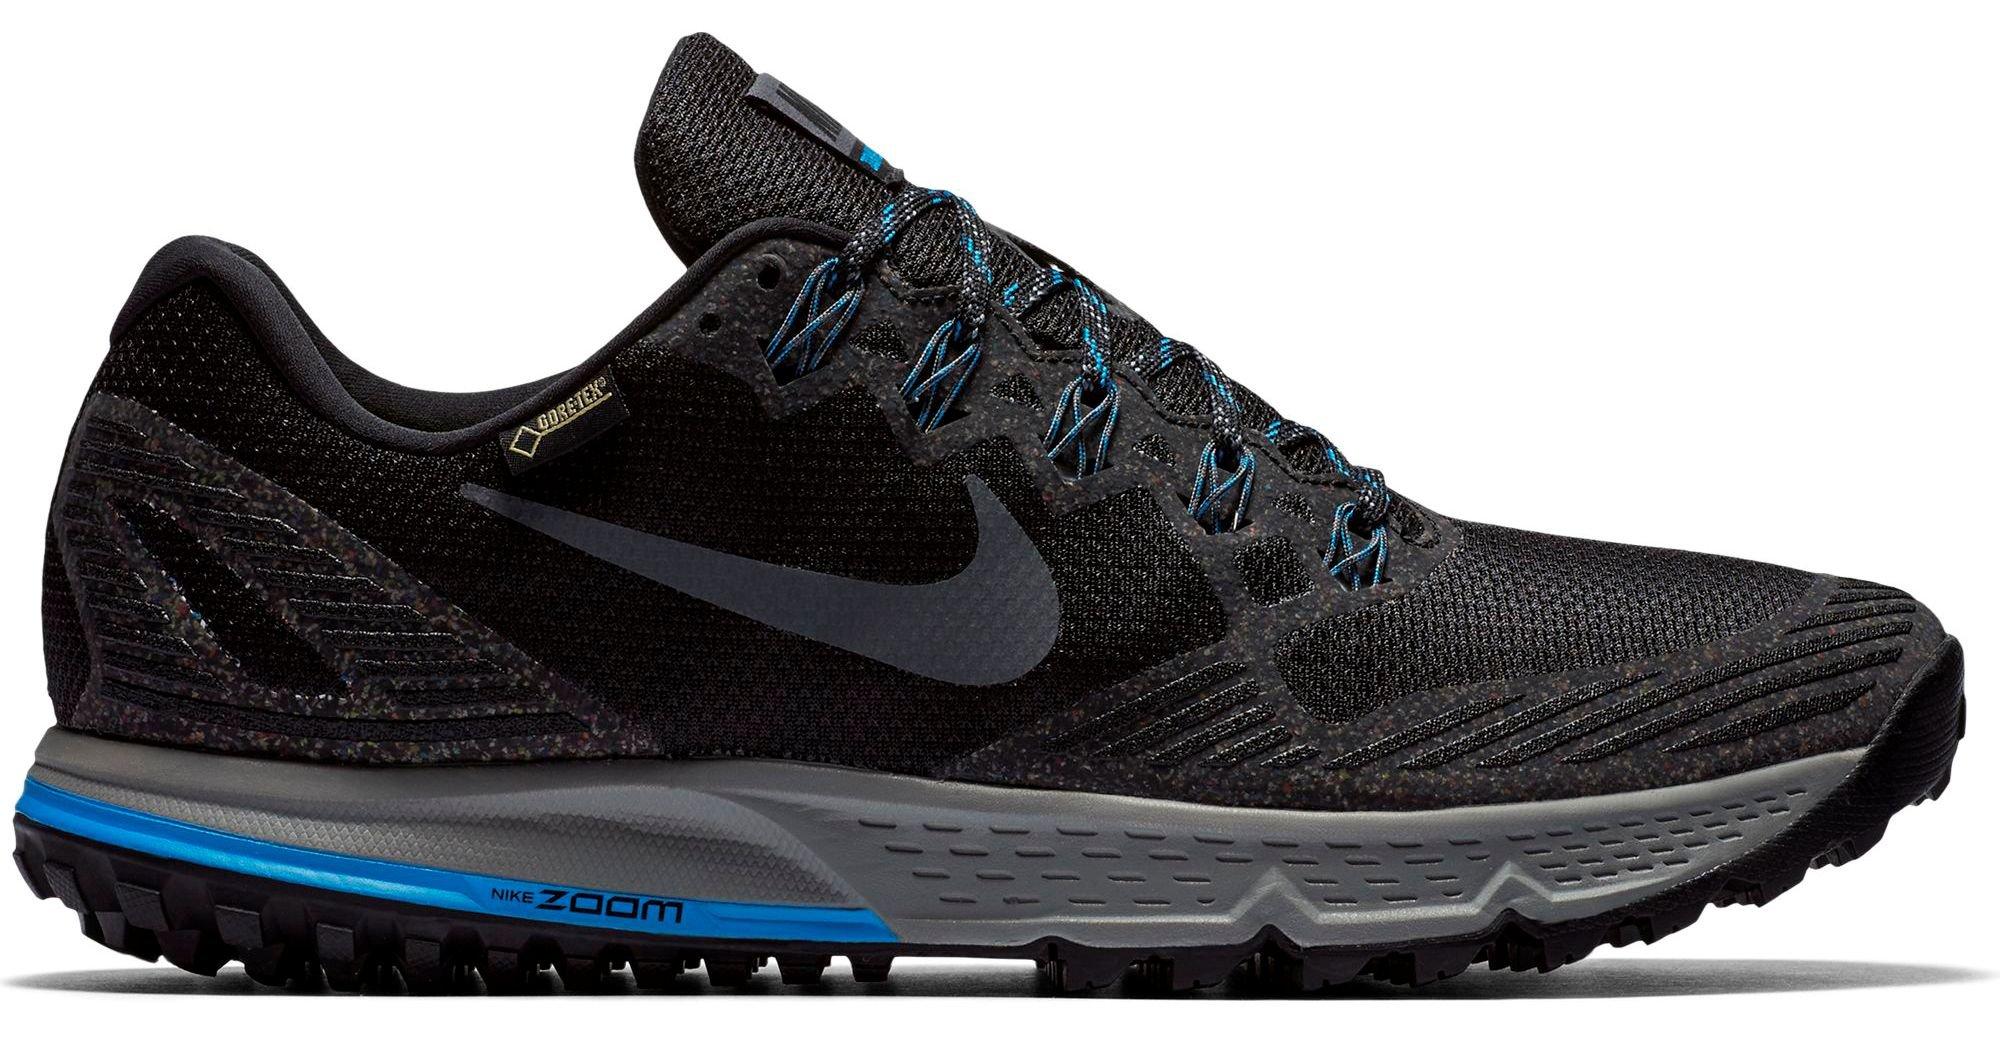 5e4476444 Купить кроссовки Nike Zoom Wildhorse 3 G-TX | Интернет-магазин RunLab